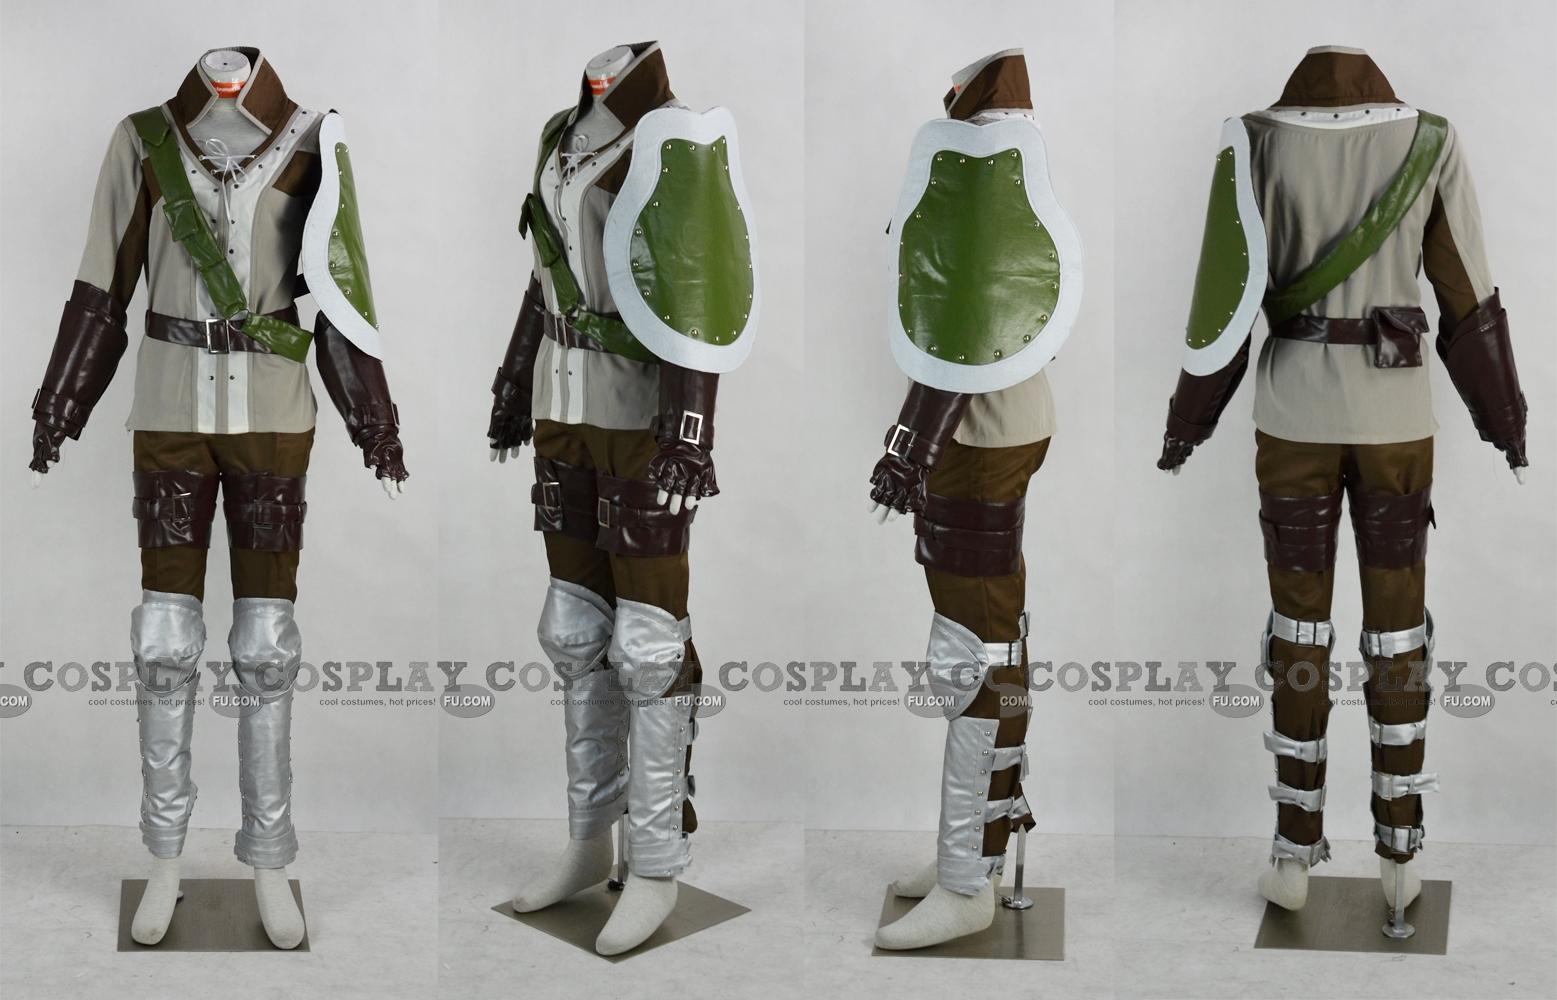 Gregor Cosplay Costume from Fire Emblem Awakening